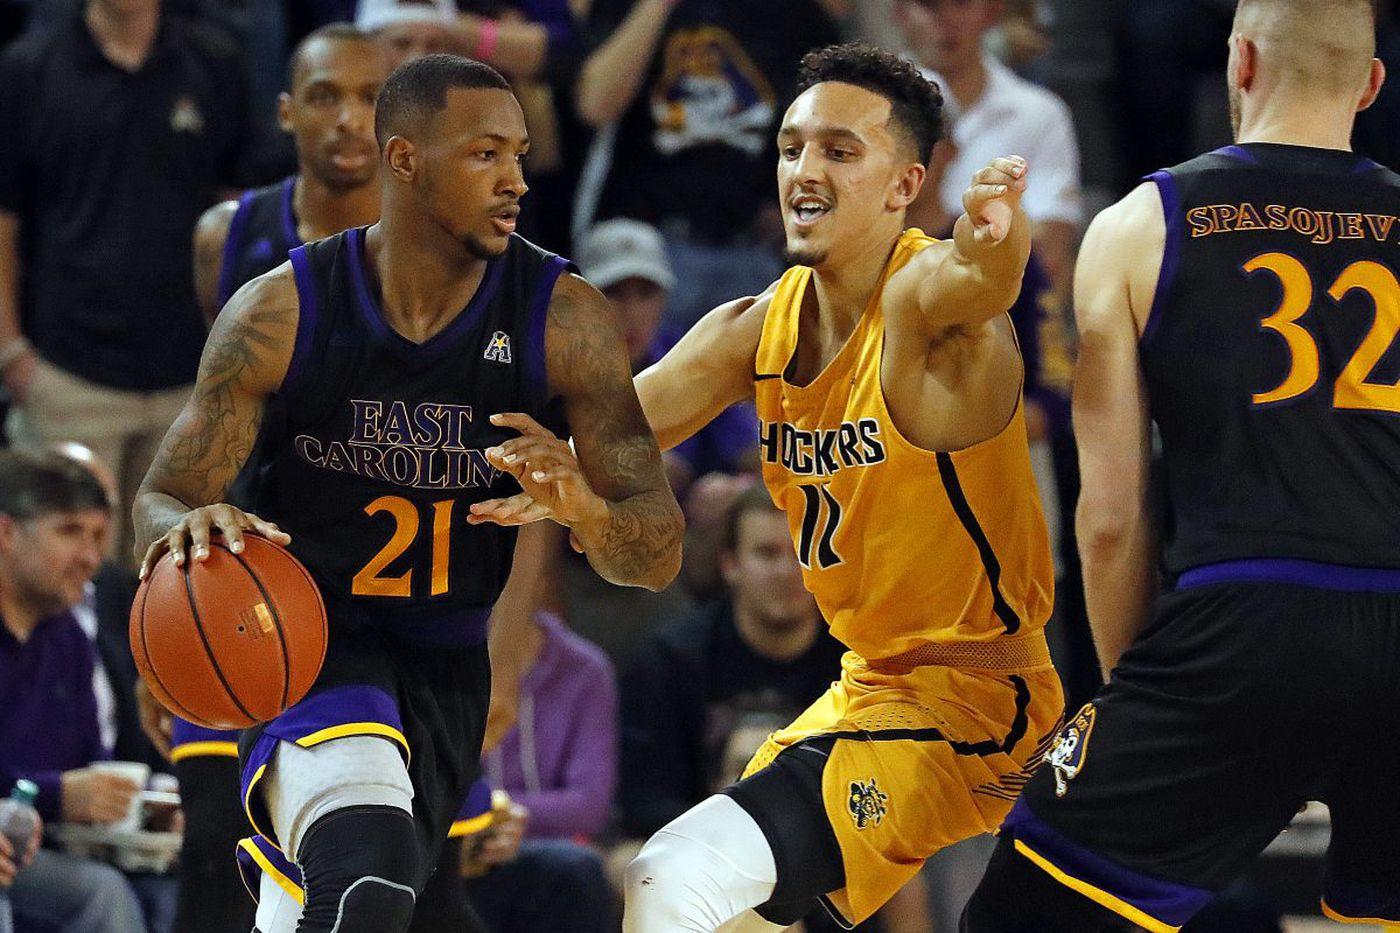 St. John's-Villanova, Temple-East Carolina, La Salle-George Washington: Wednesday's local college basketball